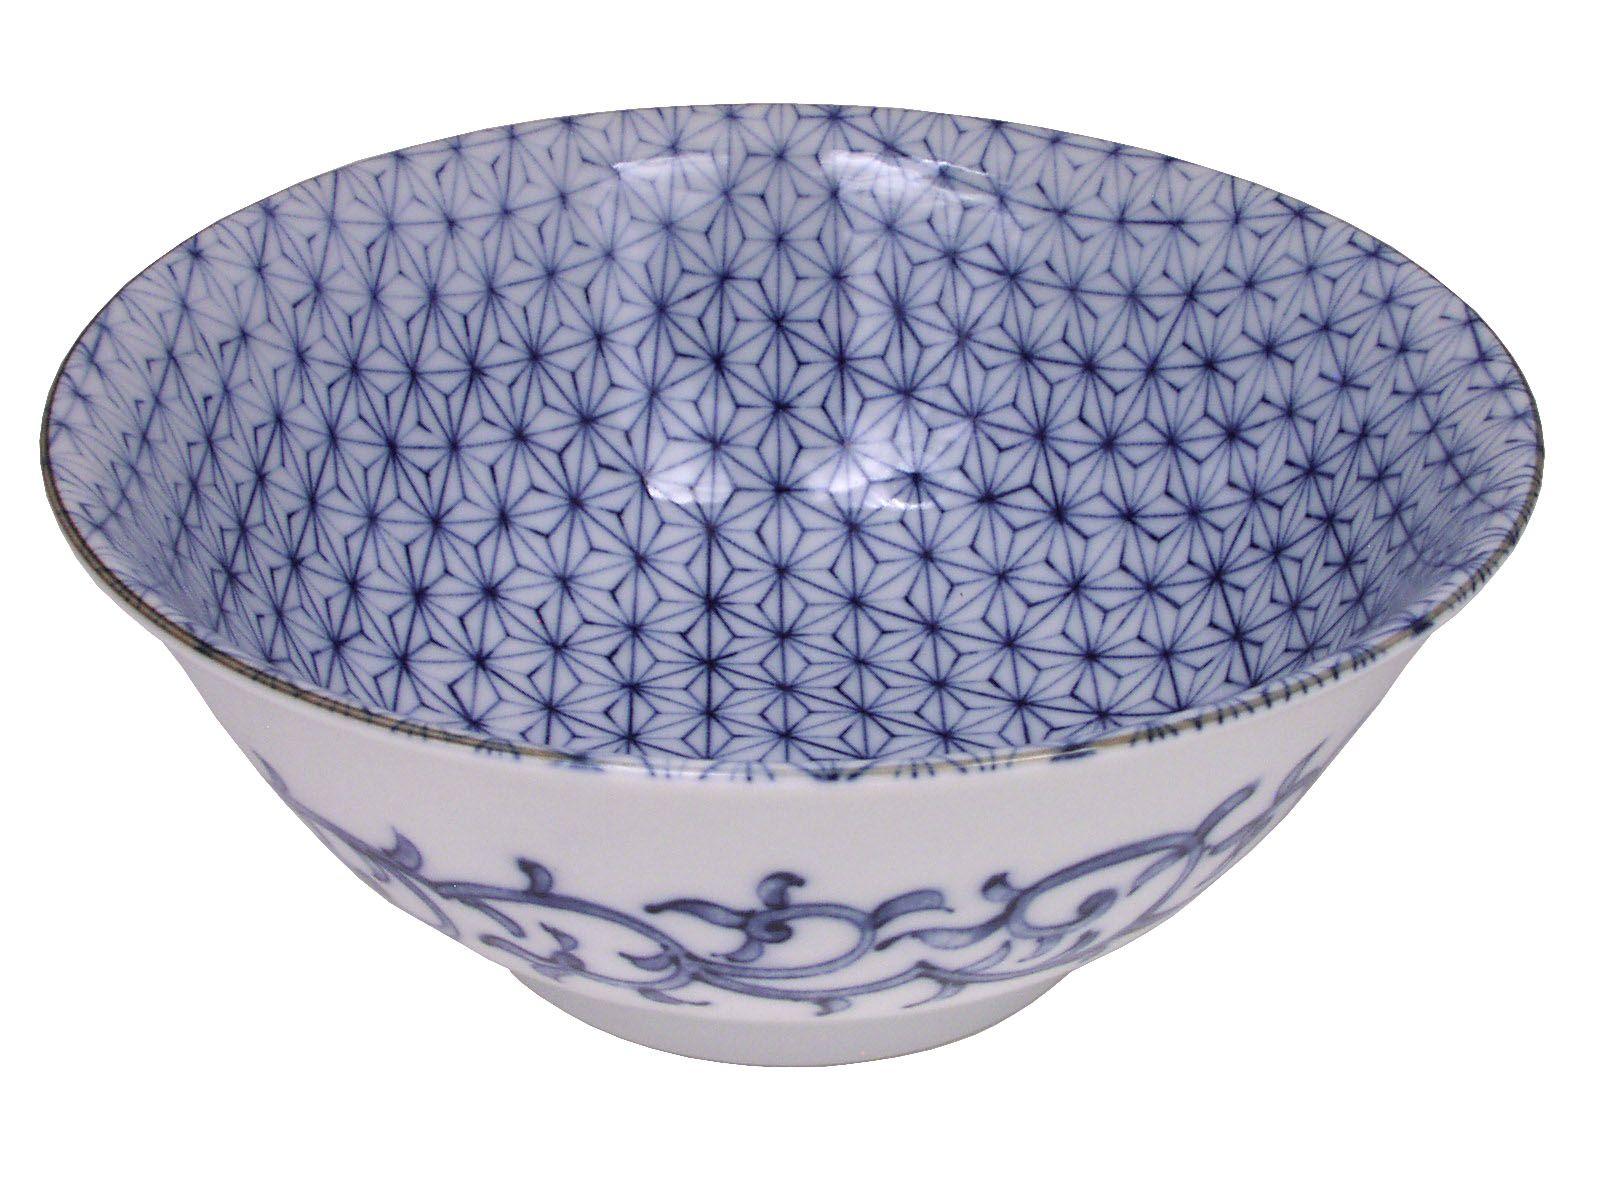 Sashiko Stitch Pattern Noodle Bowl With Images Sashiko Pattern Bowl Blue Ceramics